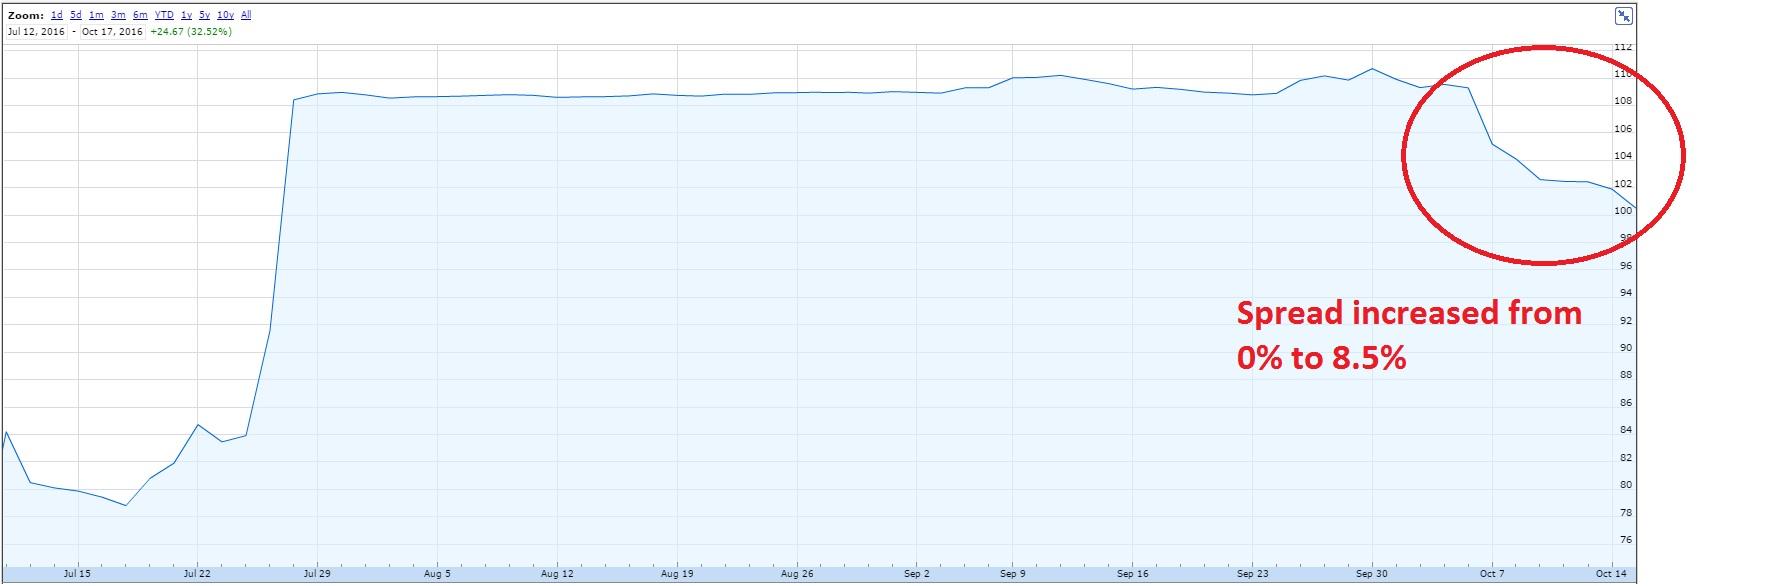 Netsuit share price